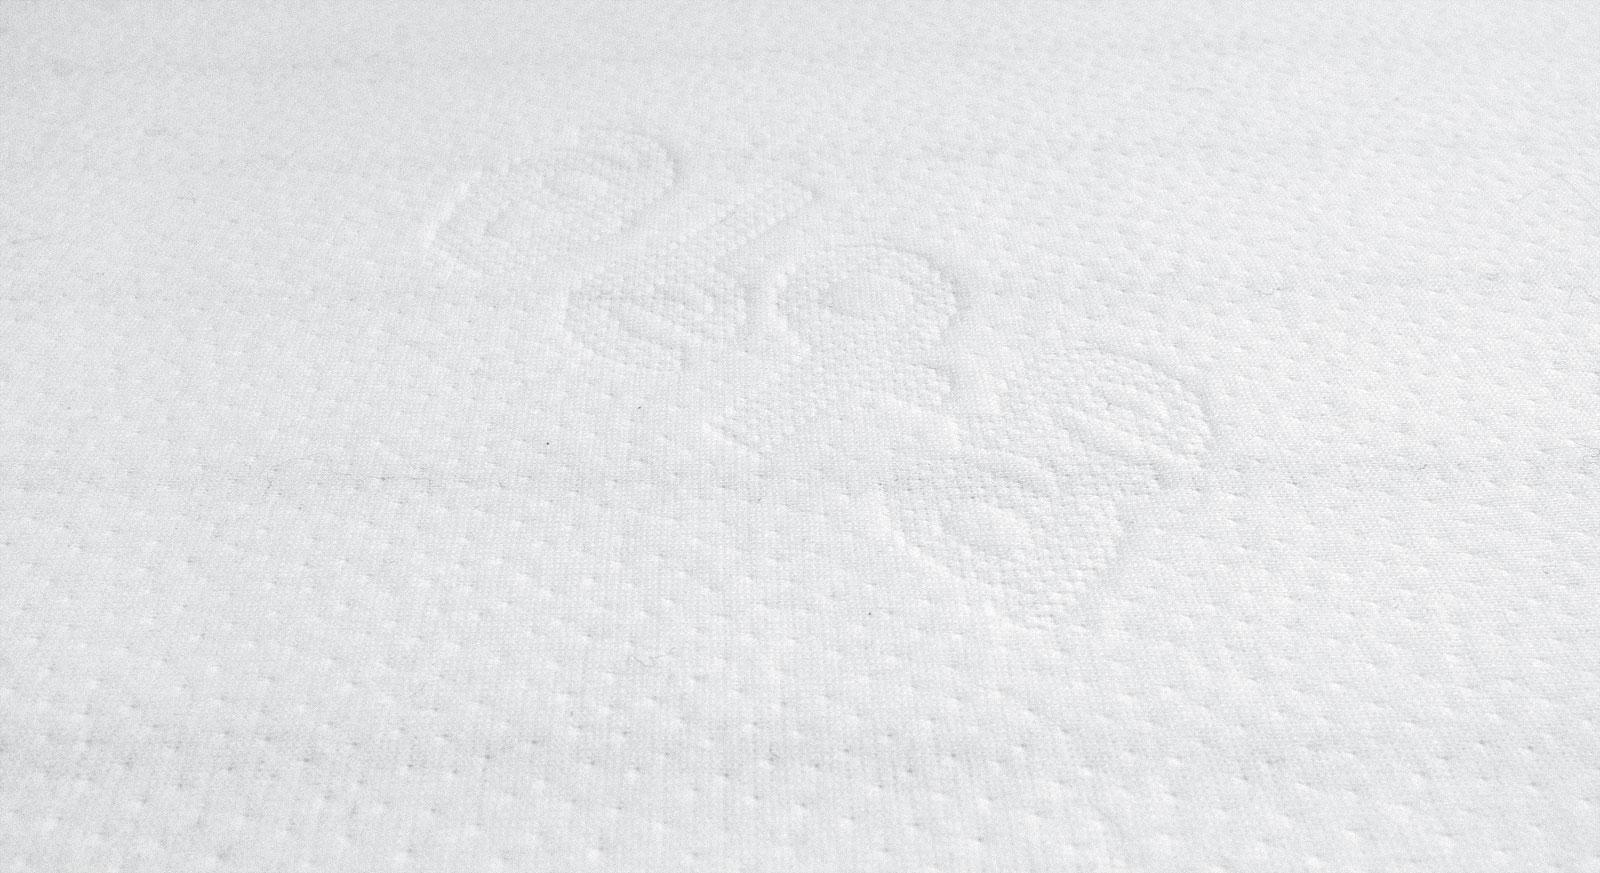 Kaltschaummatratze YouSleep mit unverstepptem Aloe Vera Bezug